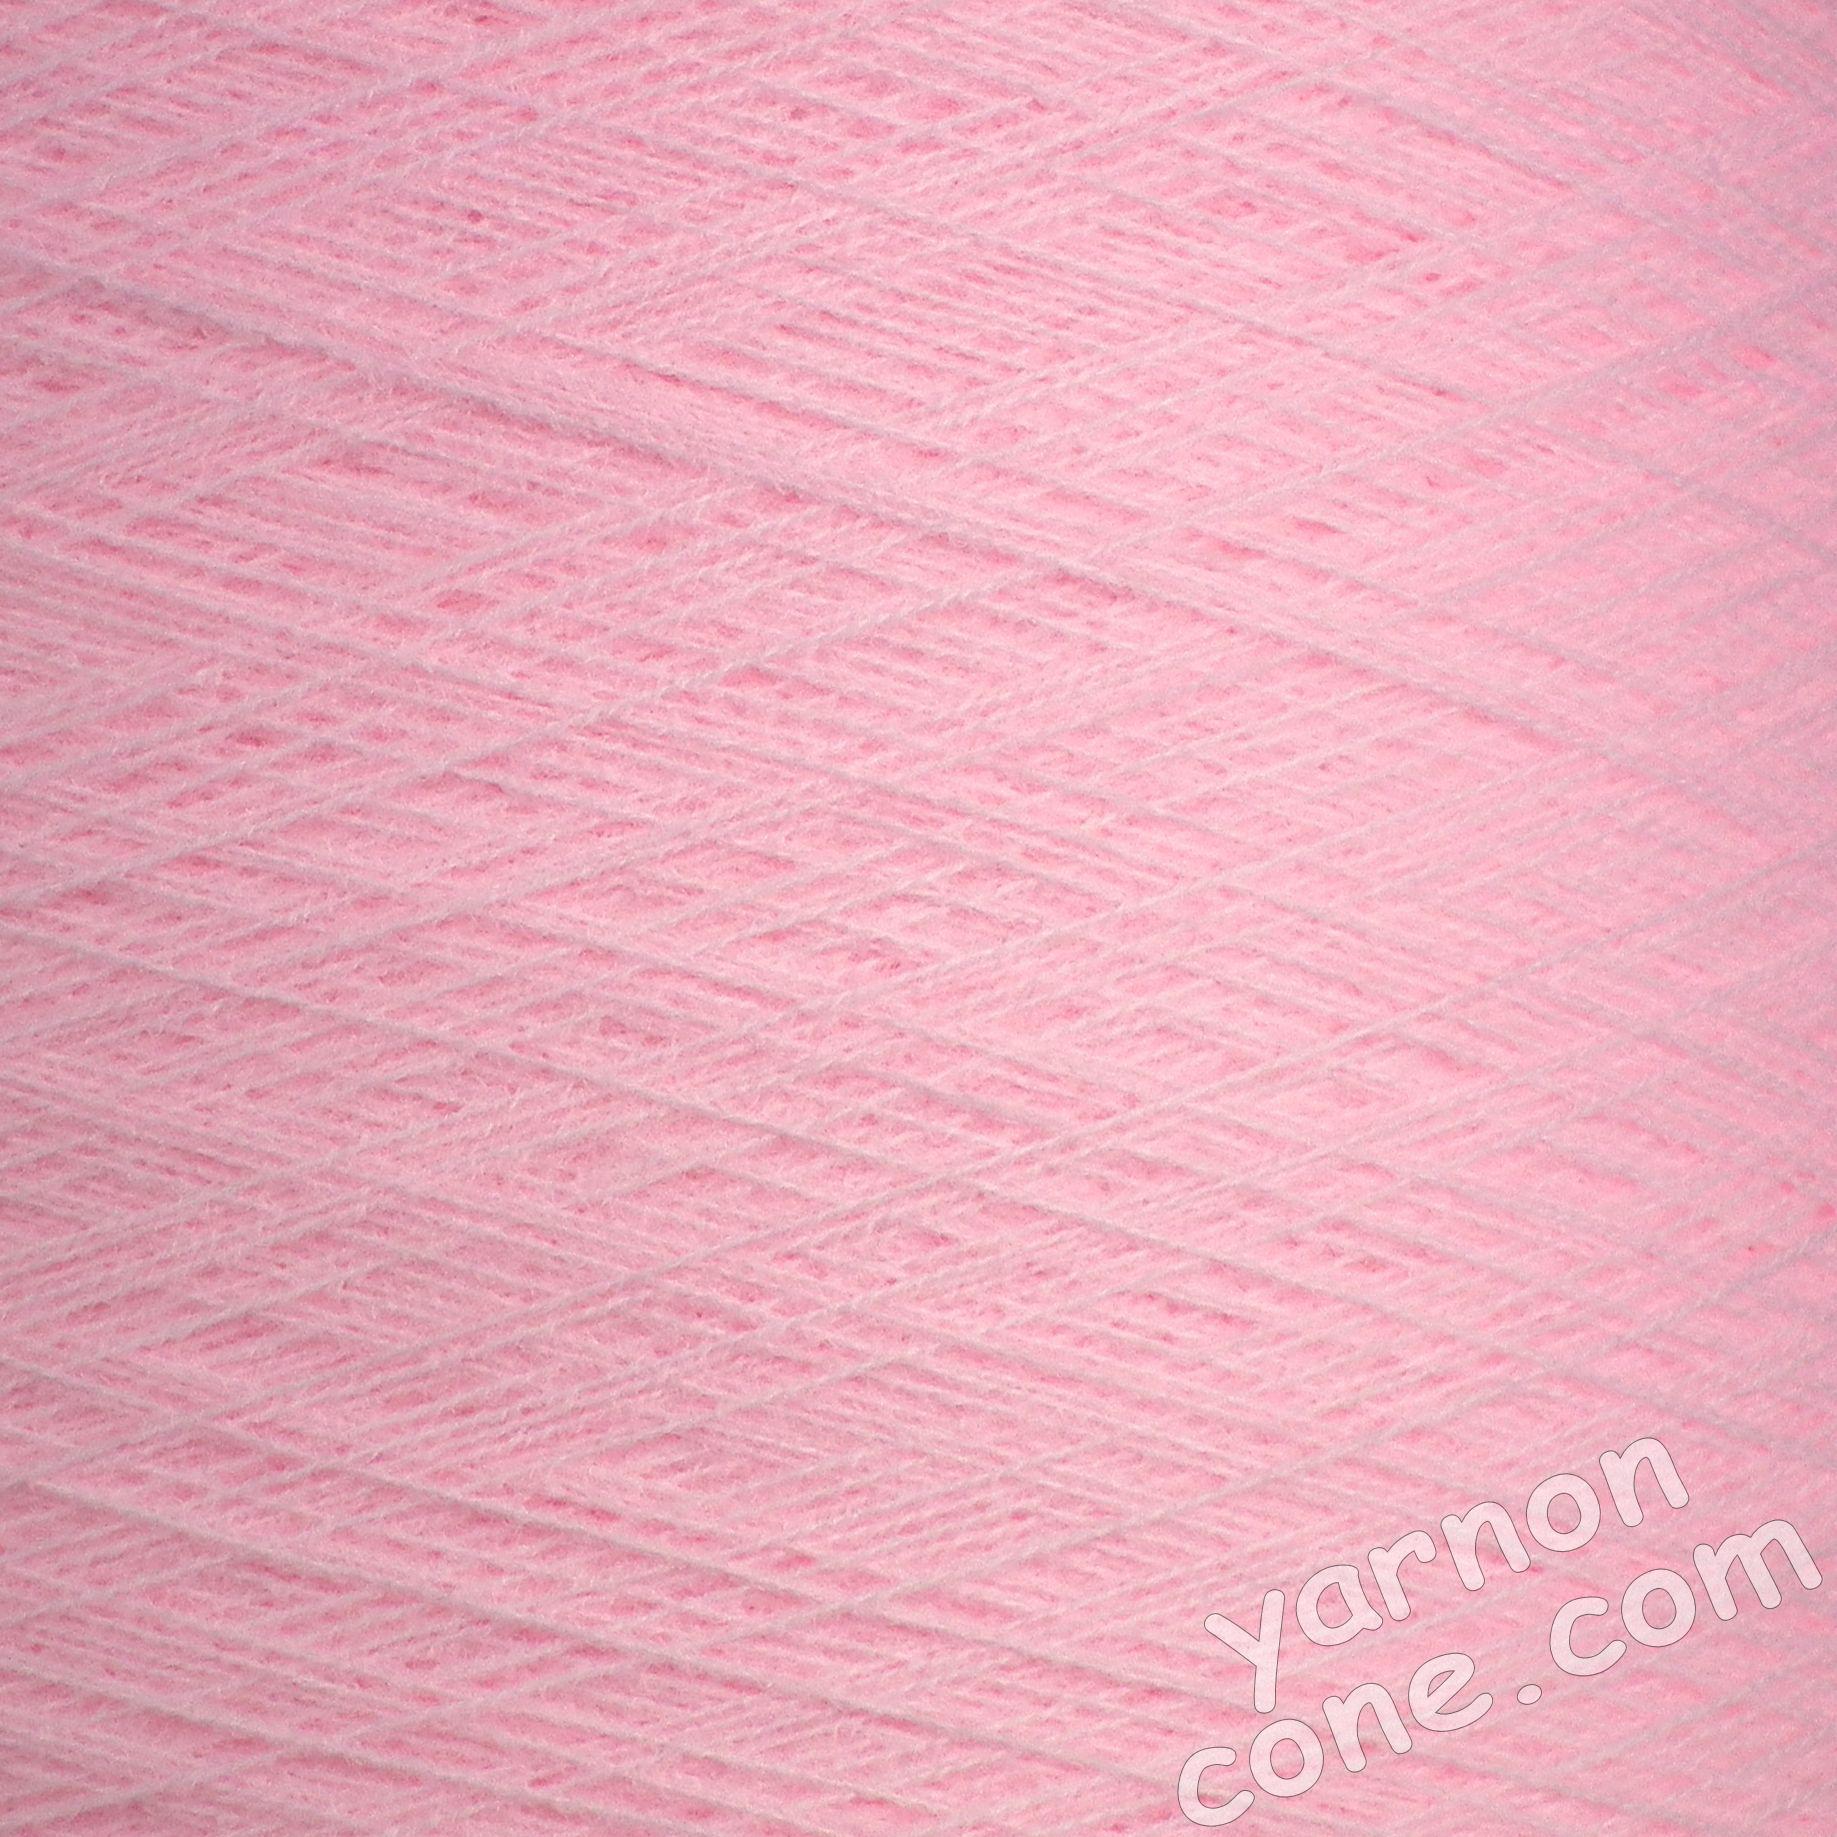 2/30s high bulk acrylic machine knitting yarn on cone 1 2 ply baby pink